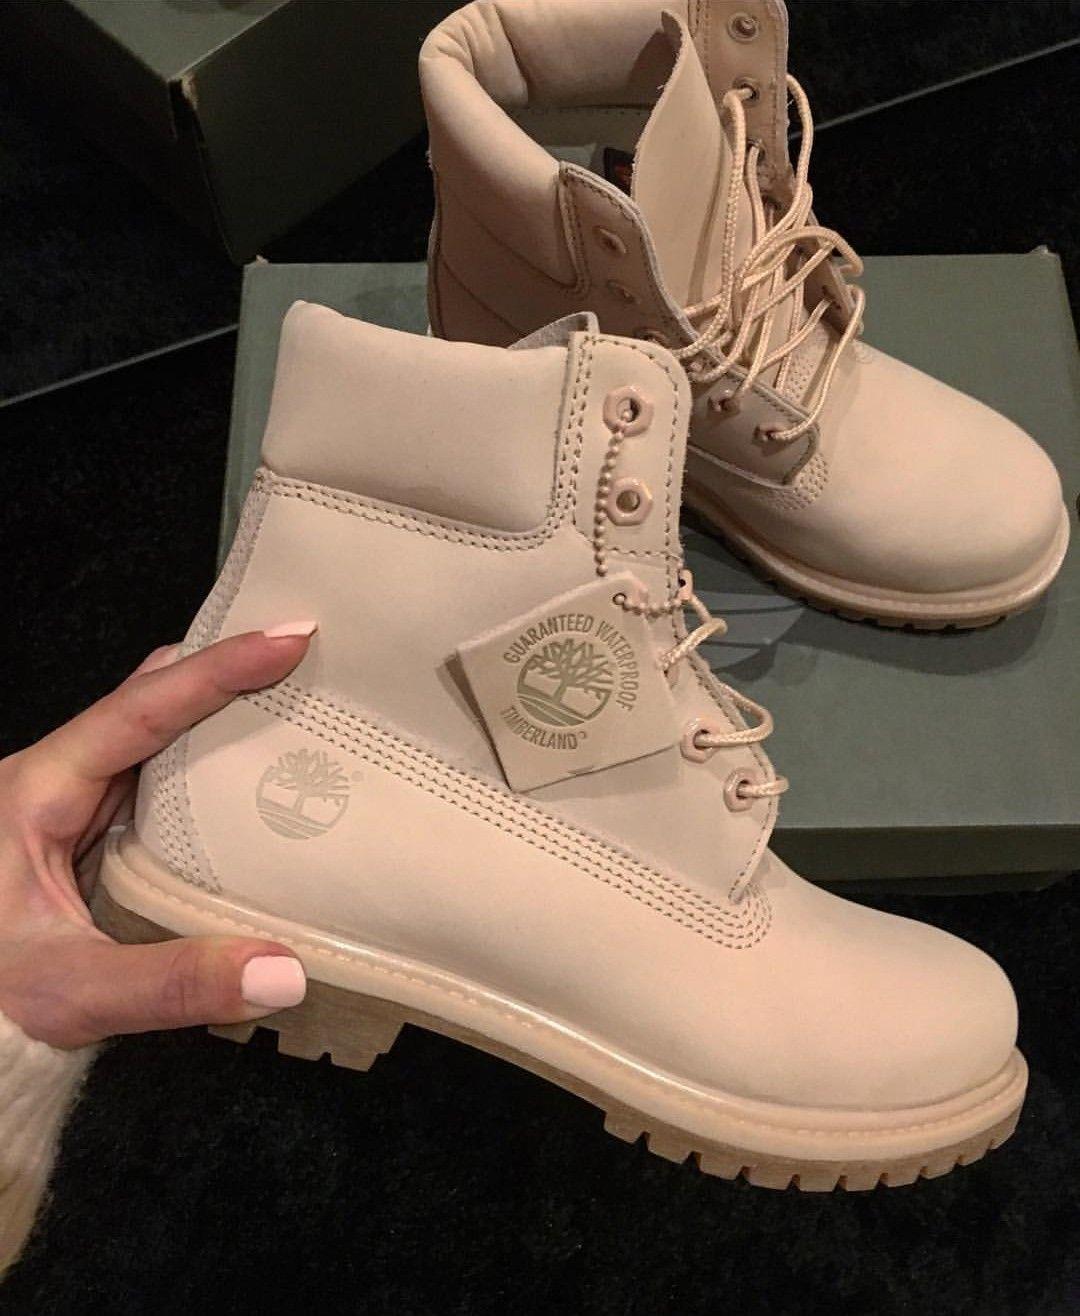 50182c3b Timberland Boots in beige/hellbraun // Foto: dori_szabo_official  Instagram